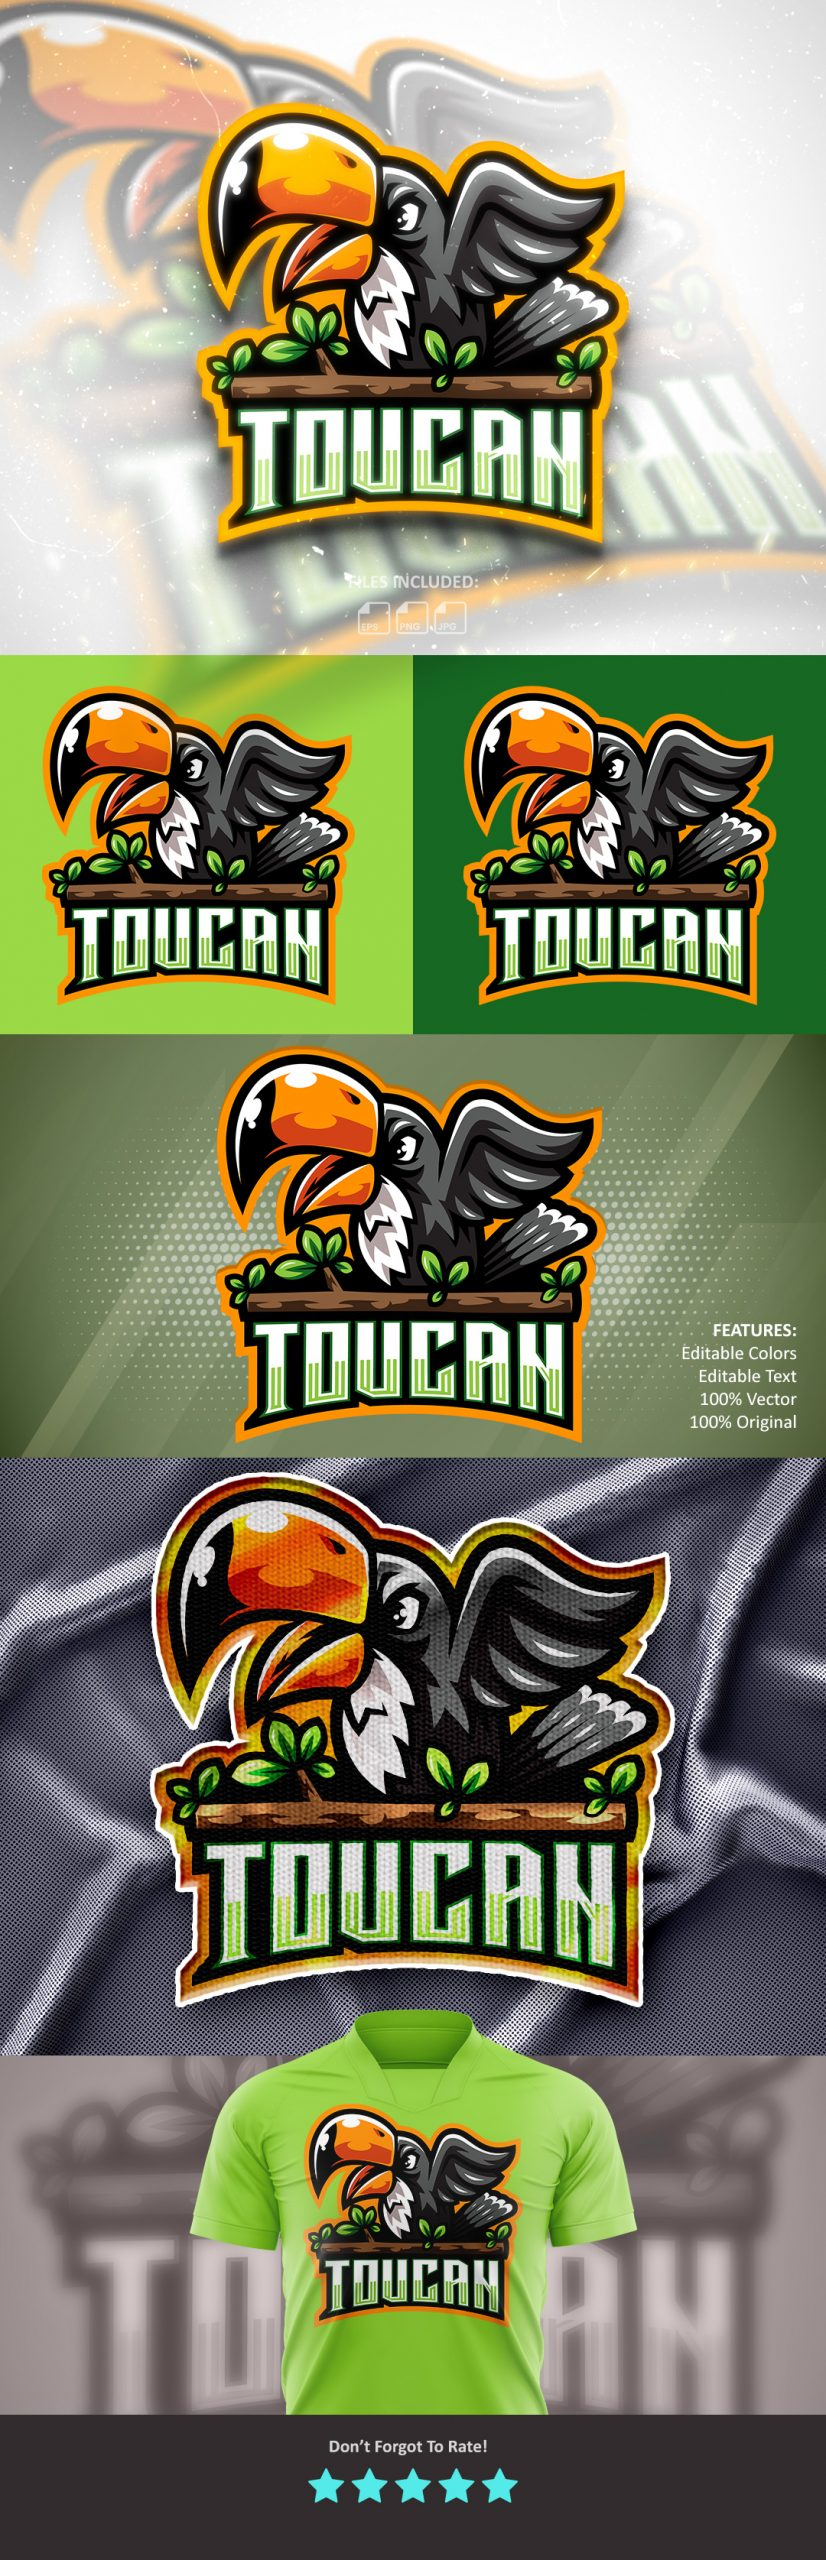 Free-Toucan-Mascot-Logo-Download